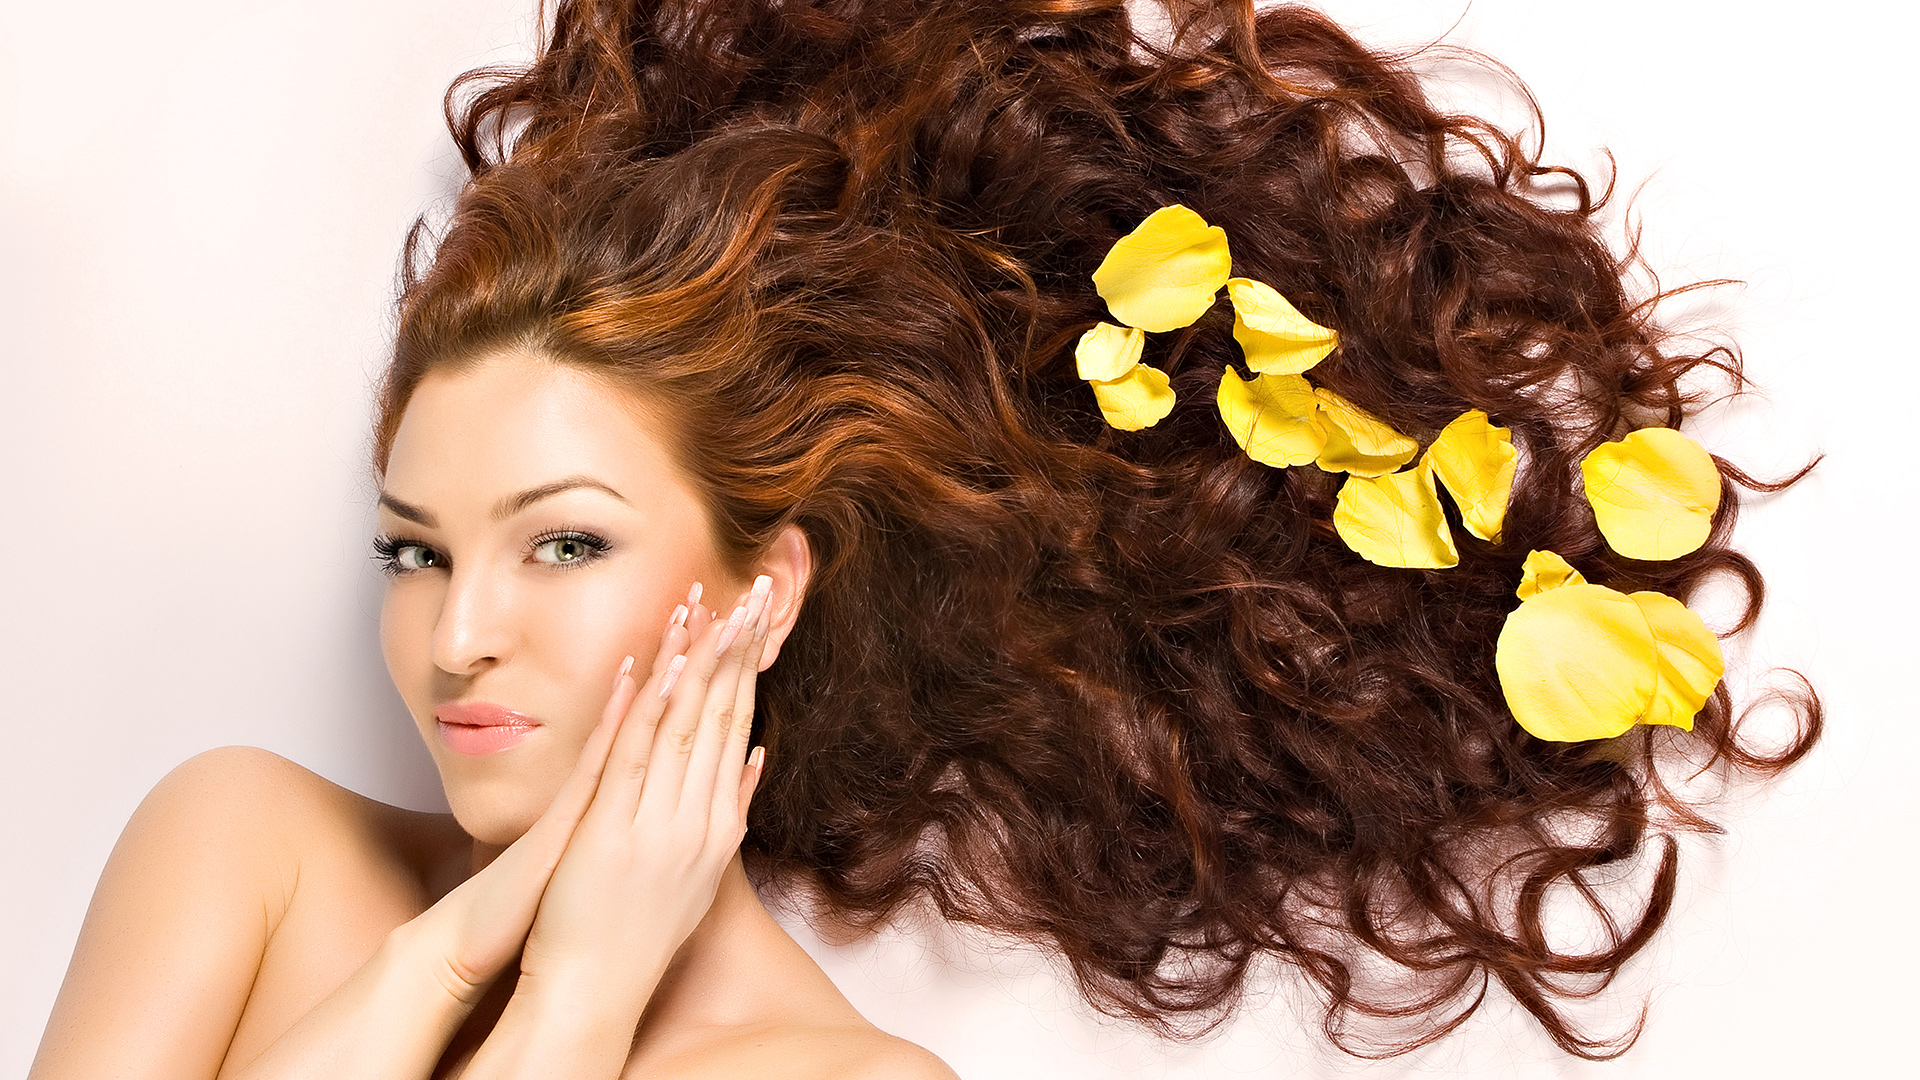 Beauty Salon Wallpaper - WallpaperSafari